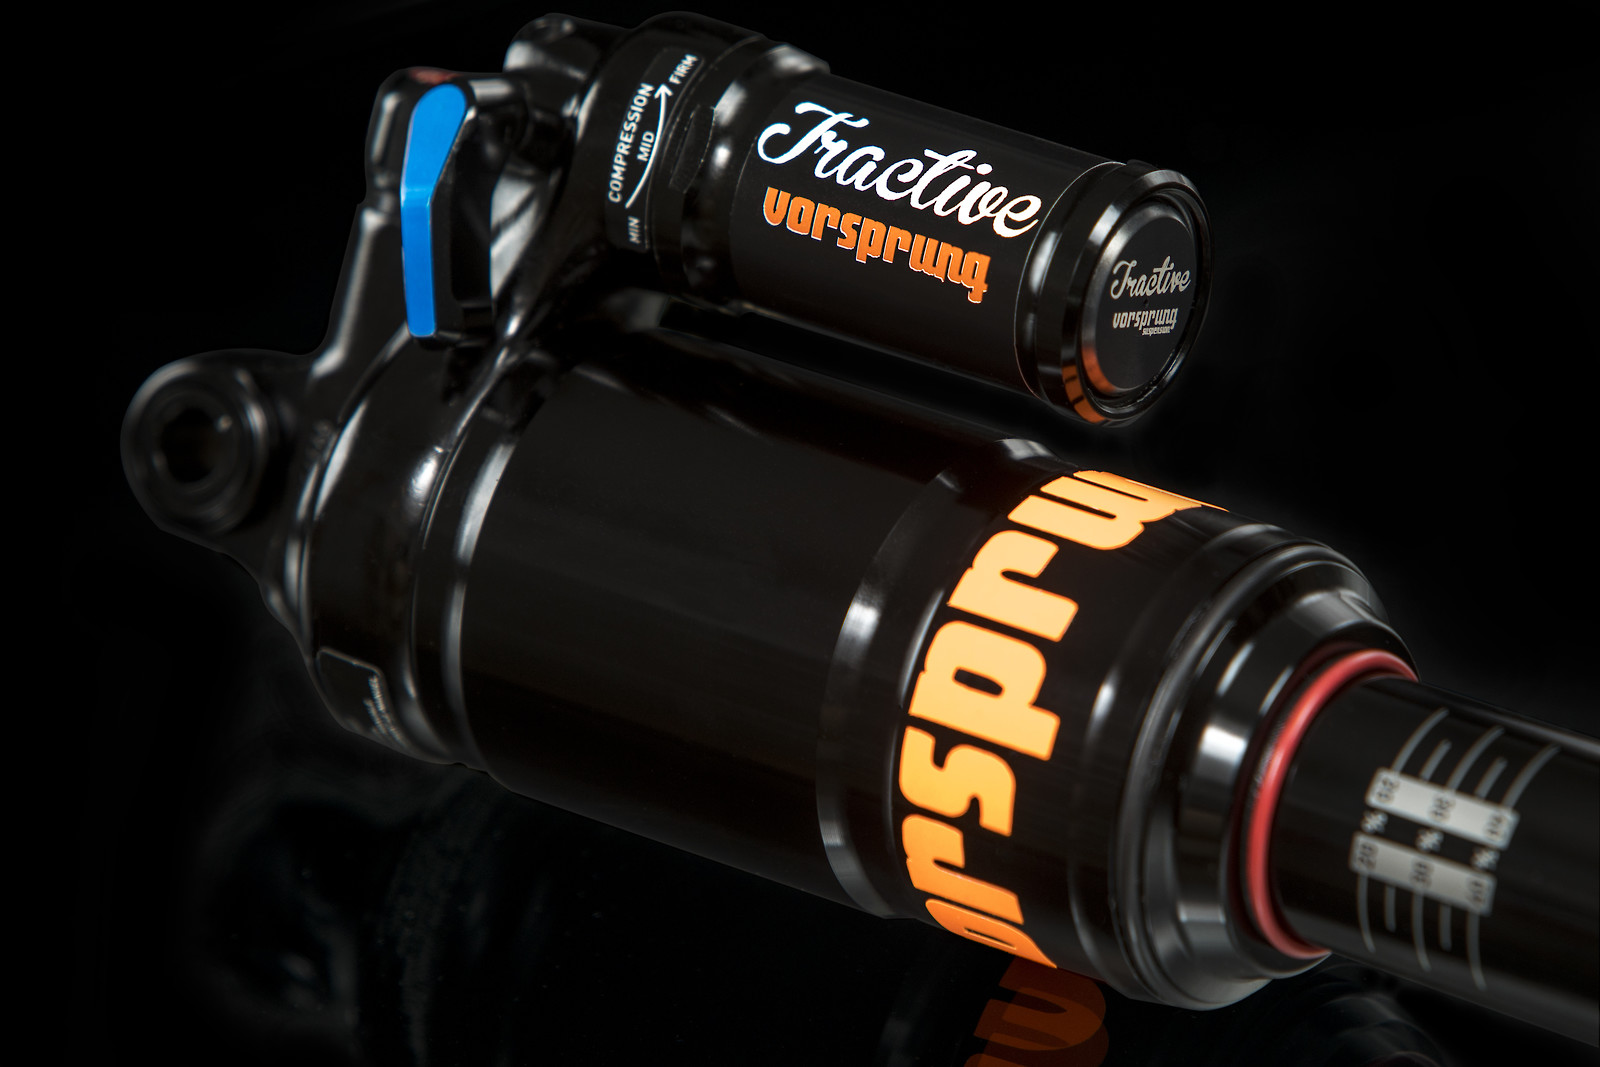 Tractive Valve Tuning System - Vorsprung - Mountain Biking Pictures - Vital MTB